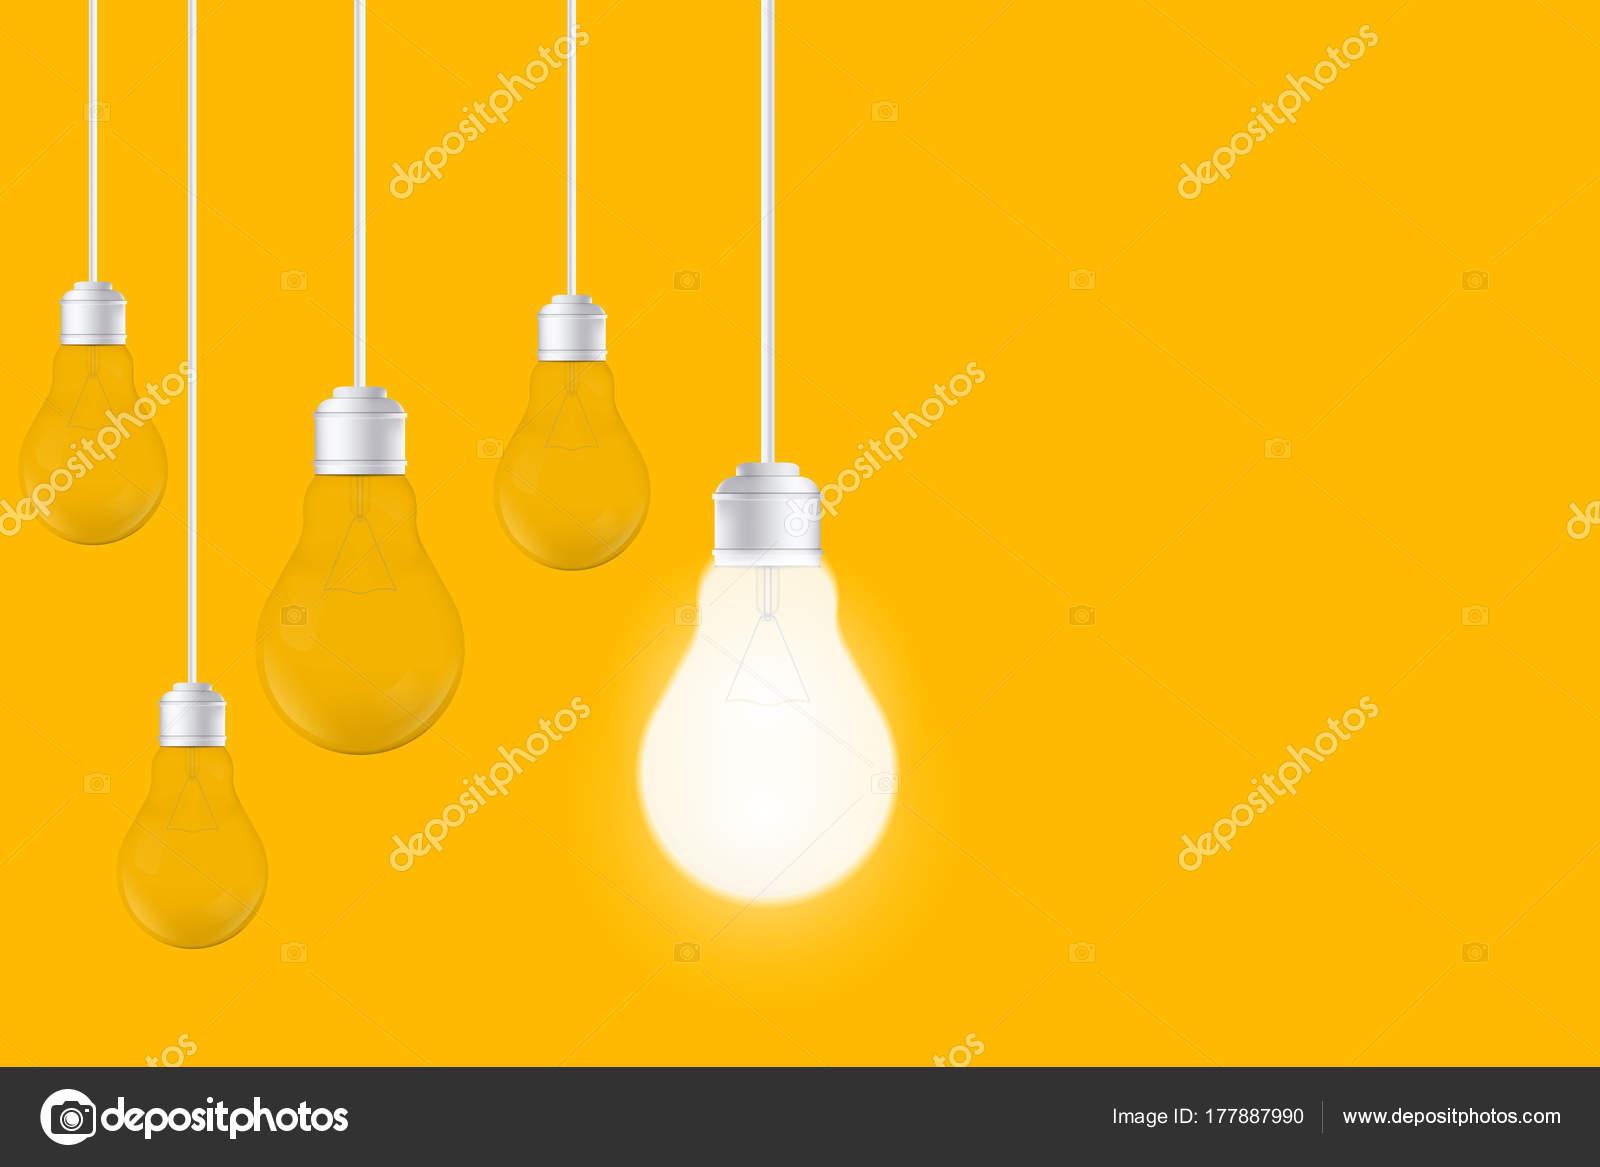 Creative vector isolated light bulbs yellow background art design